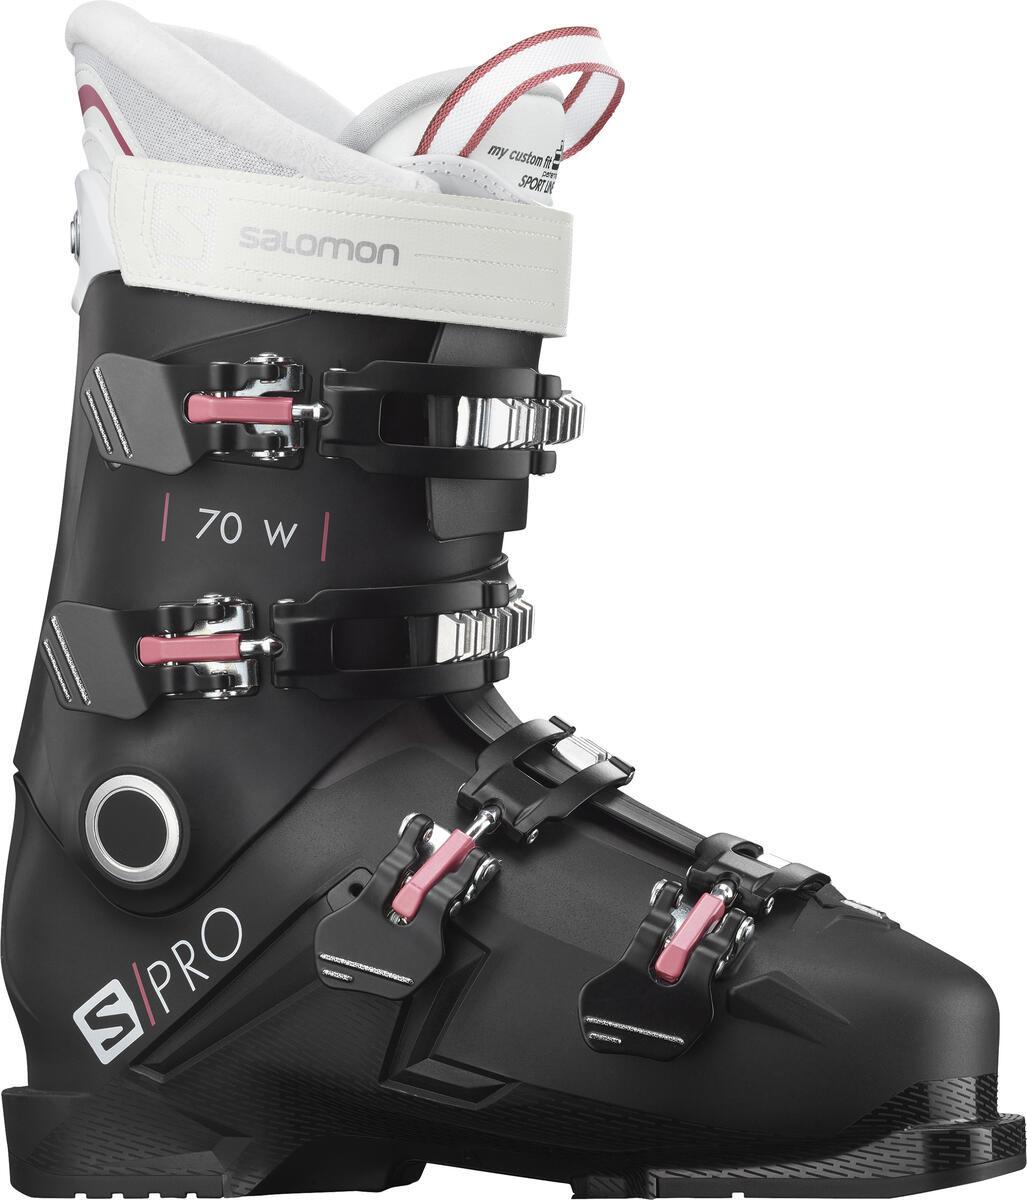 Salomon S/Pro 70 W